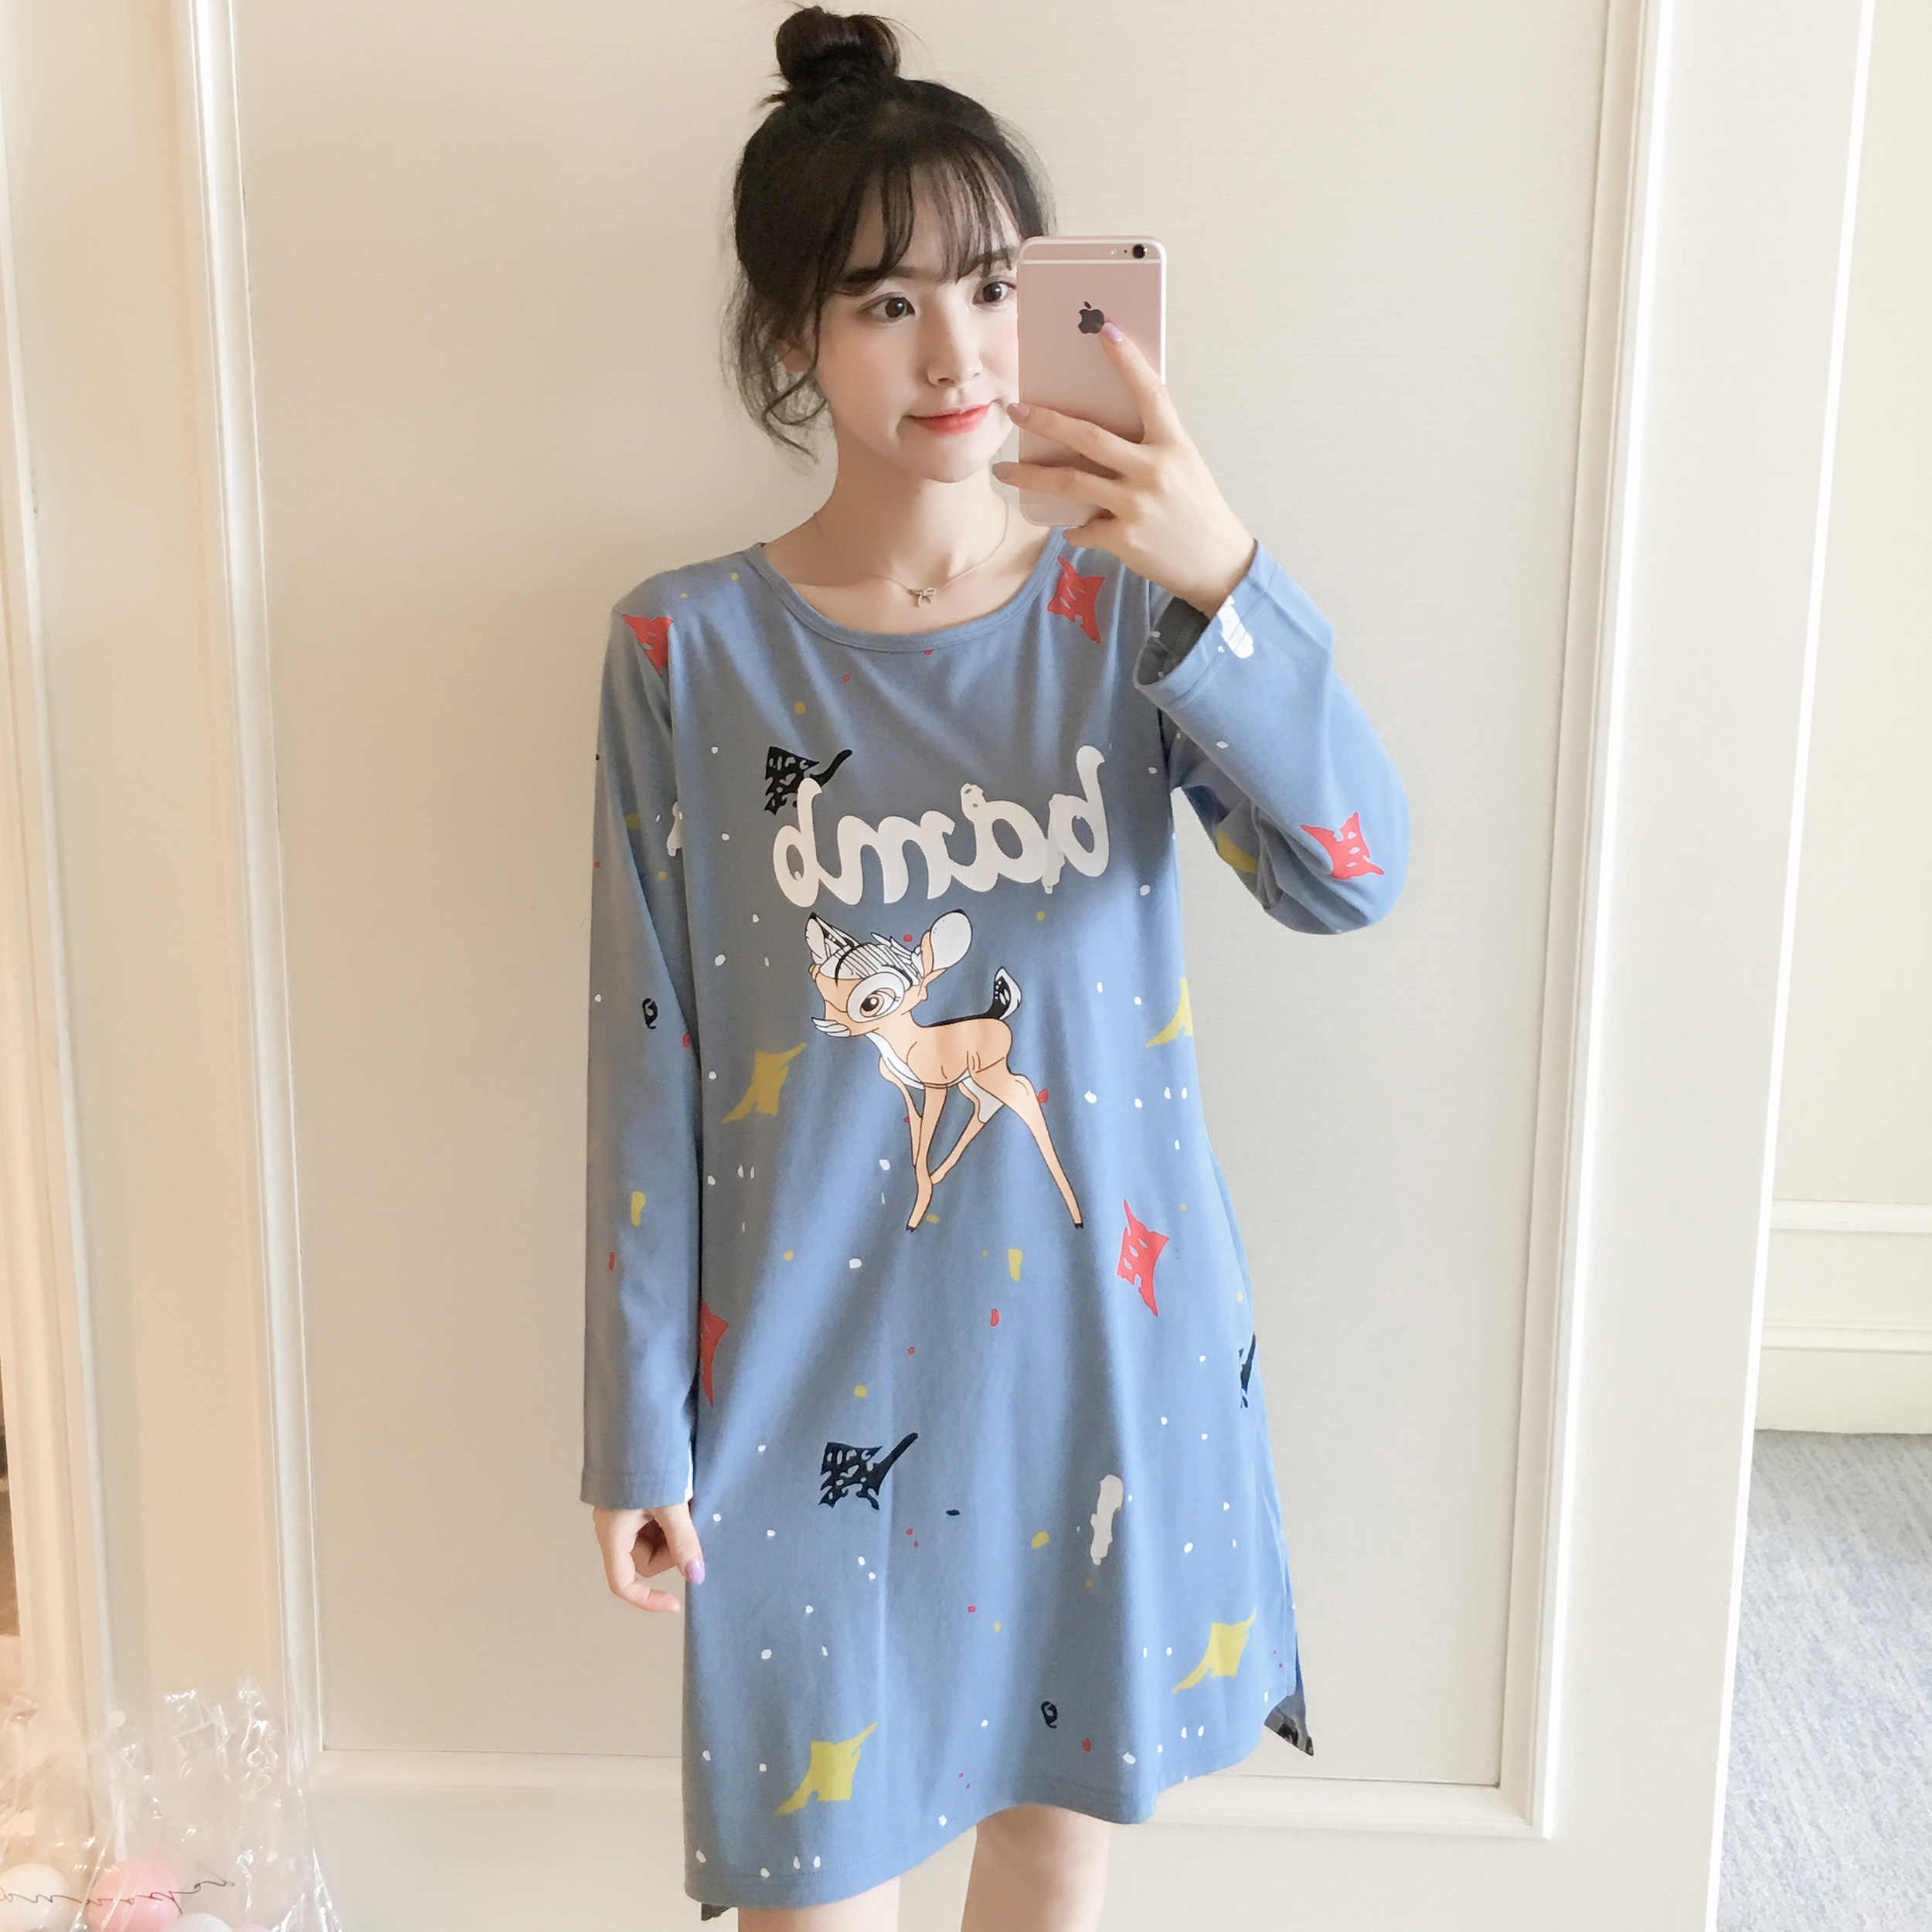 2c5674f835 ... 2018 Autumn Winter Warm Cotton Nightgown Girl Sleepwear Nightgown  Cartoon Print Nightdress Home Wear Lovely Nightgowns ...